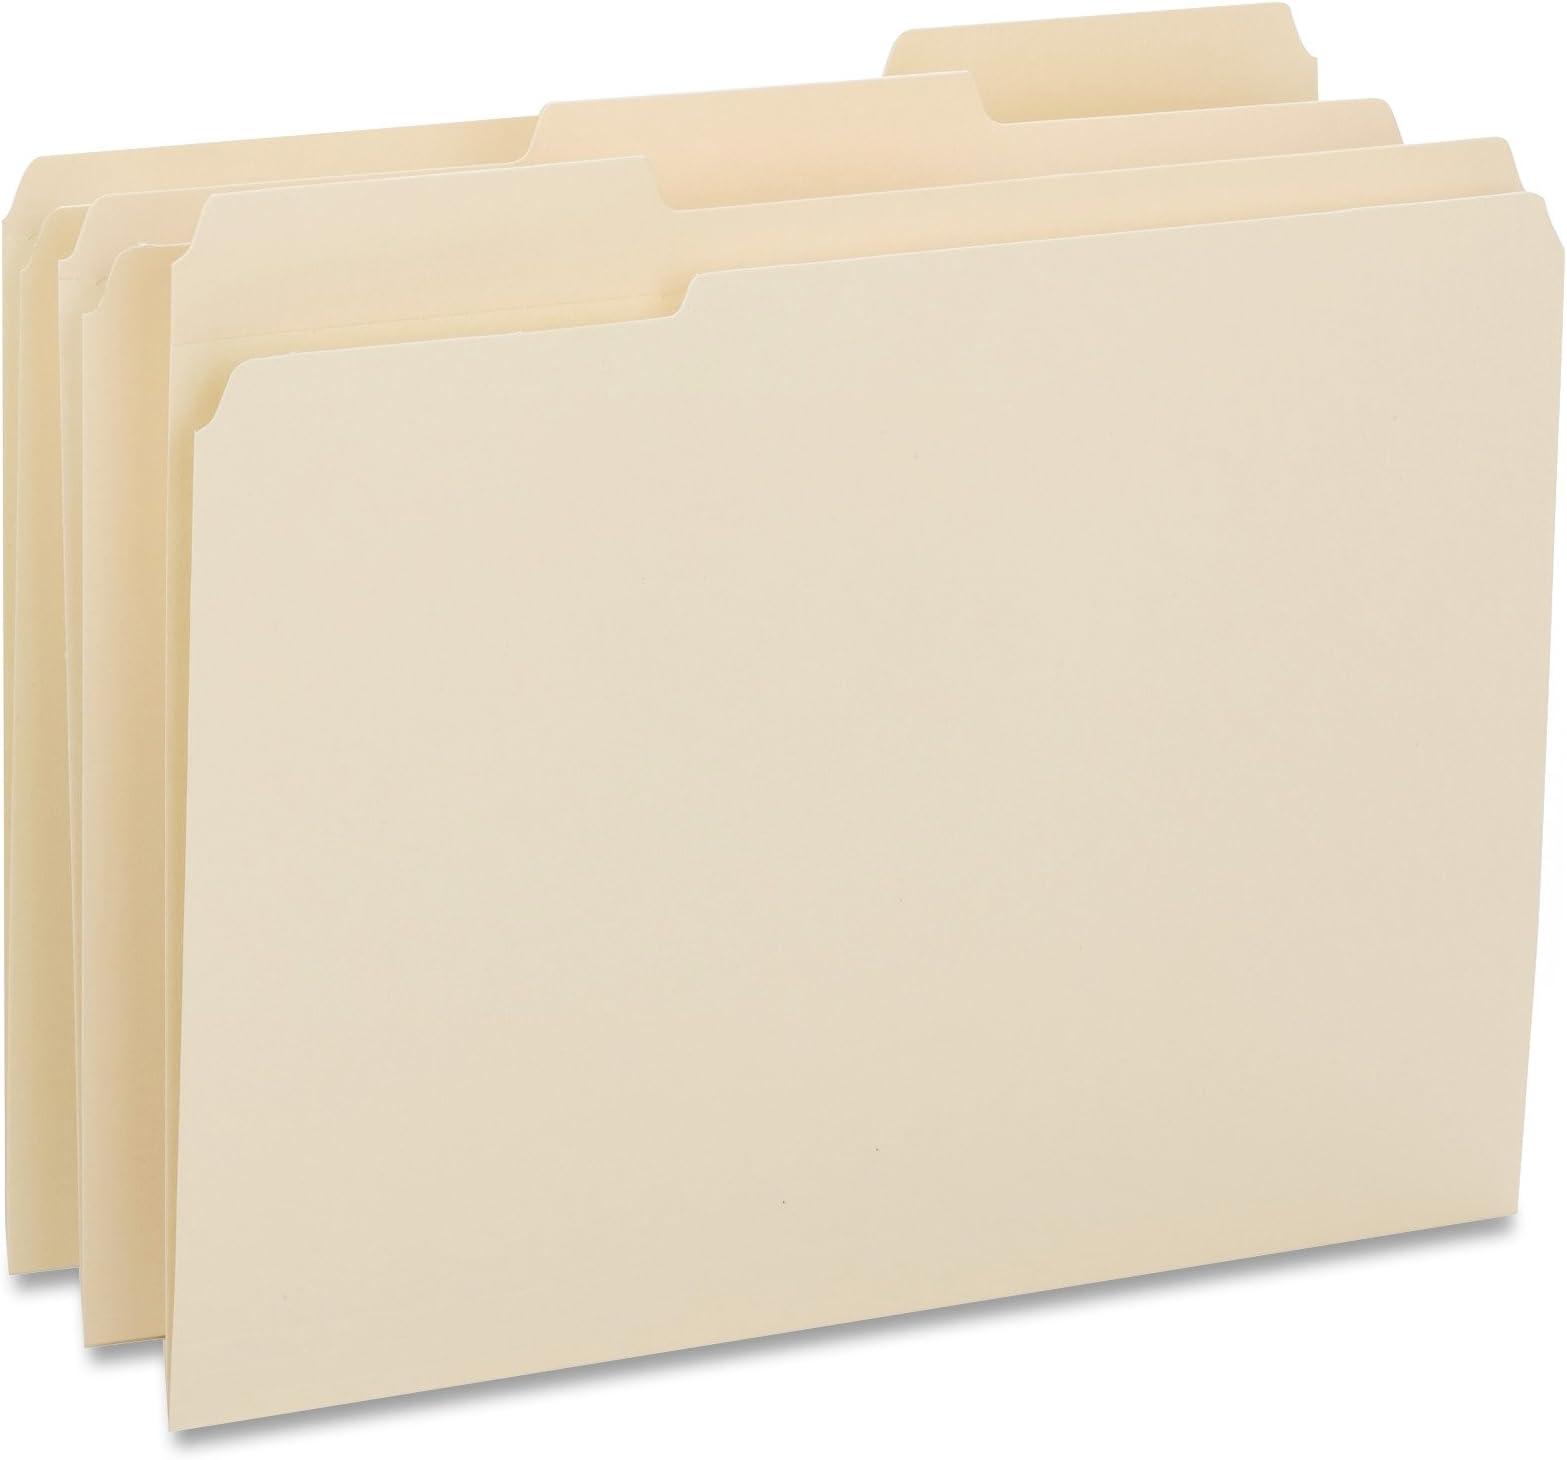 Business Source 1/3 Cut Top Tab File Folders - Box of 50 - Manila